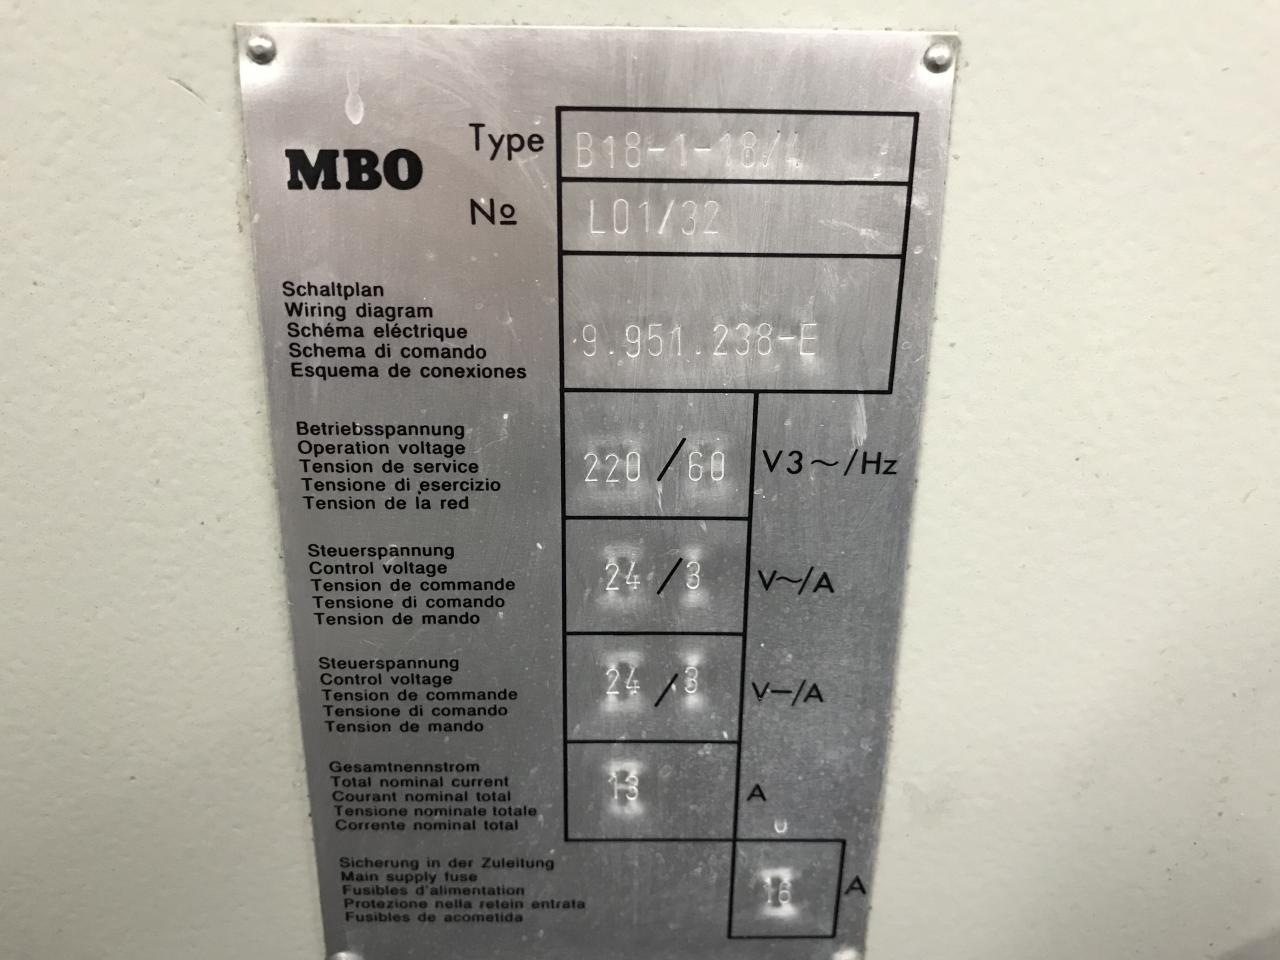 mbo folder diagram for wiring wiring diagram u2022 rh zerobin co MBO Folder Rollers MBO Folder Machine